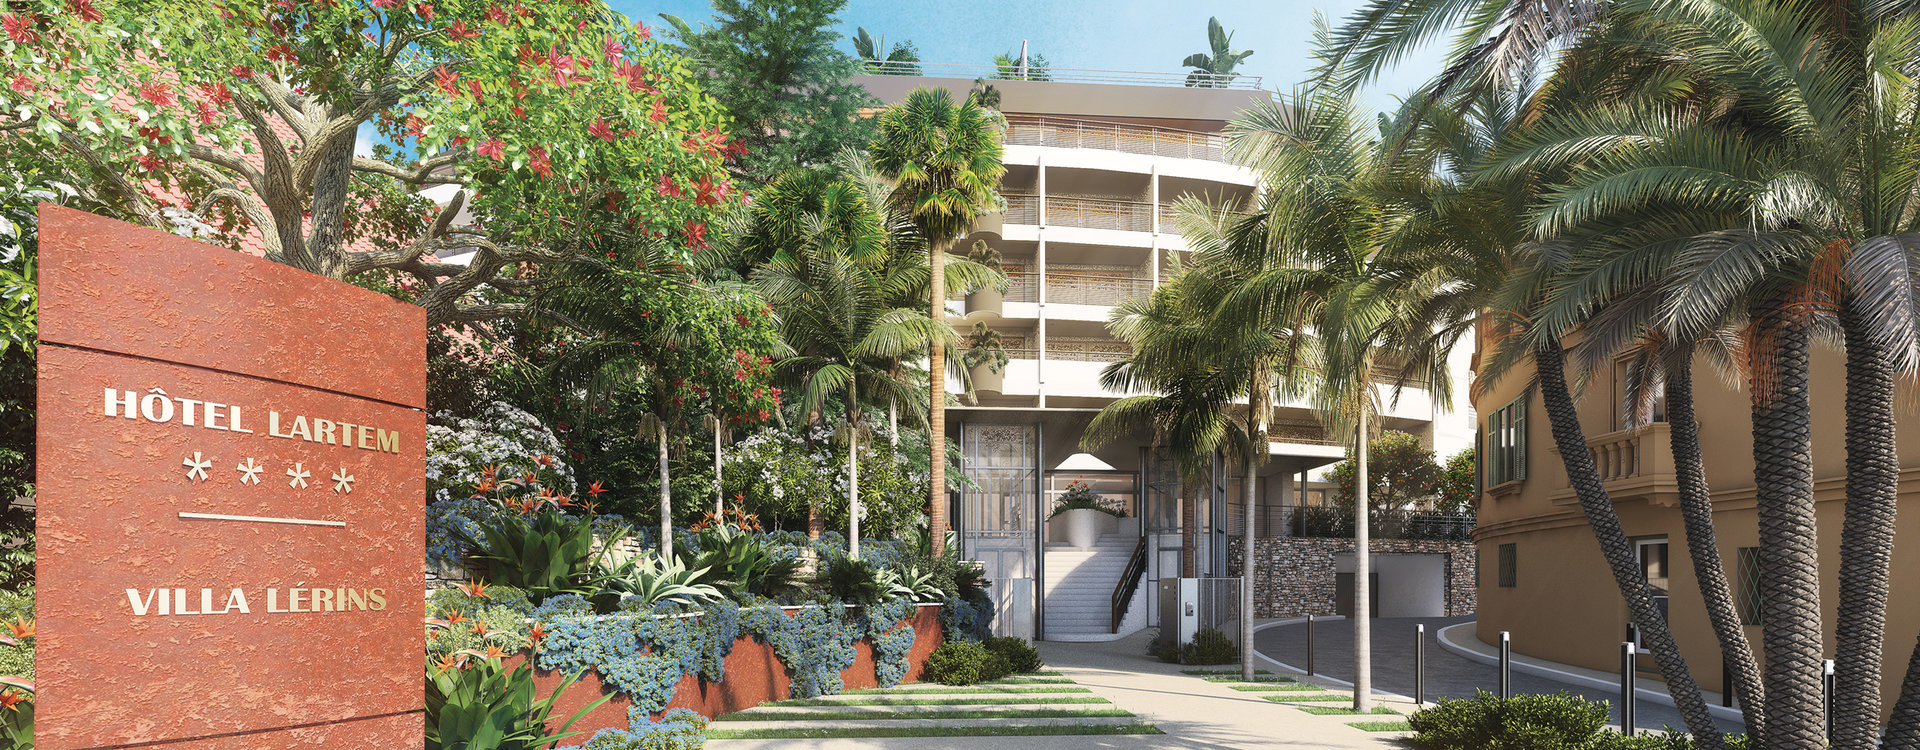 Résidence Villa Lérins - Cannes